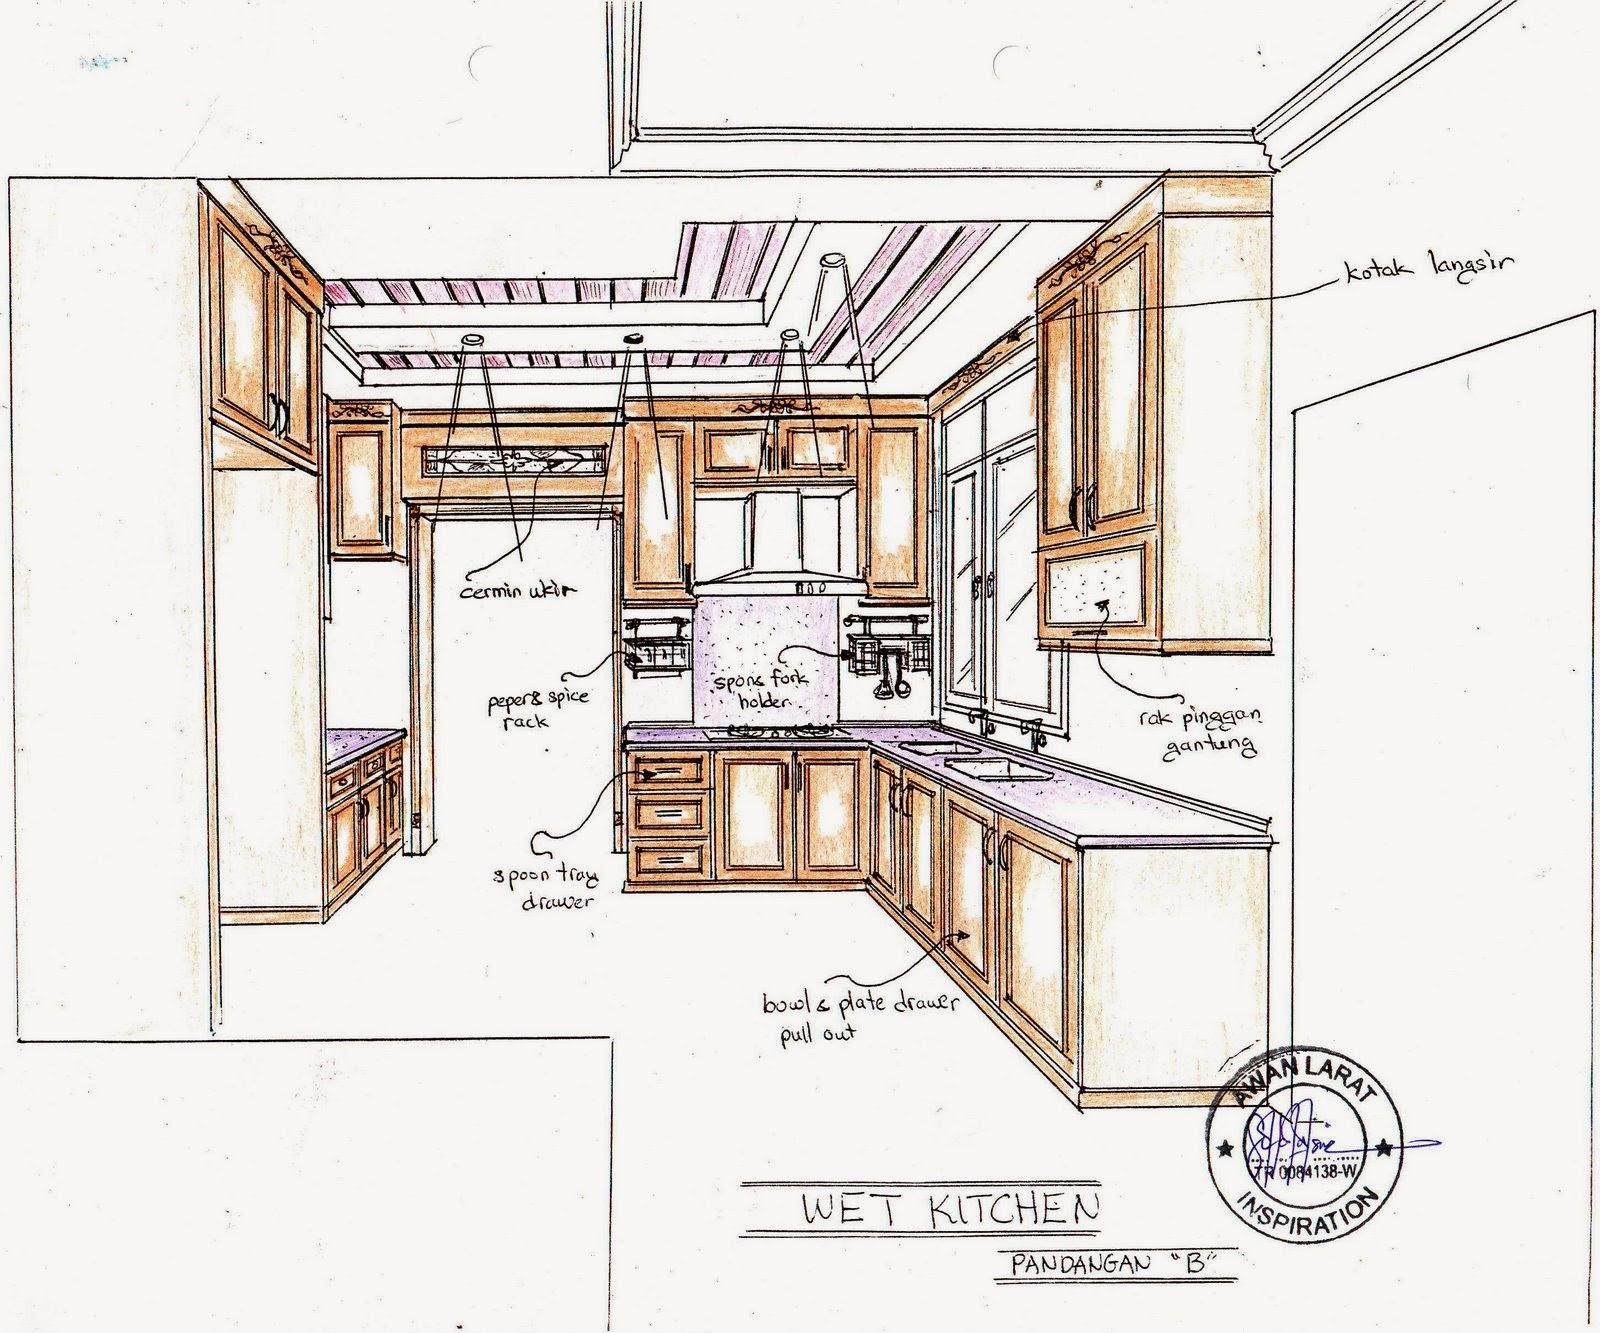 Gambar perspektif dapur